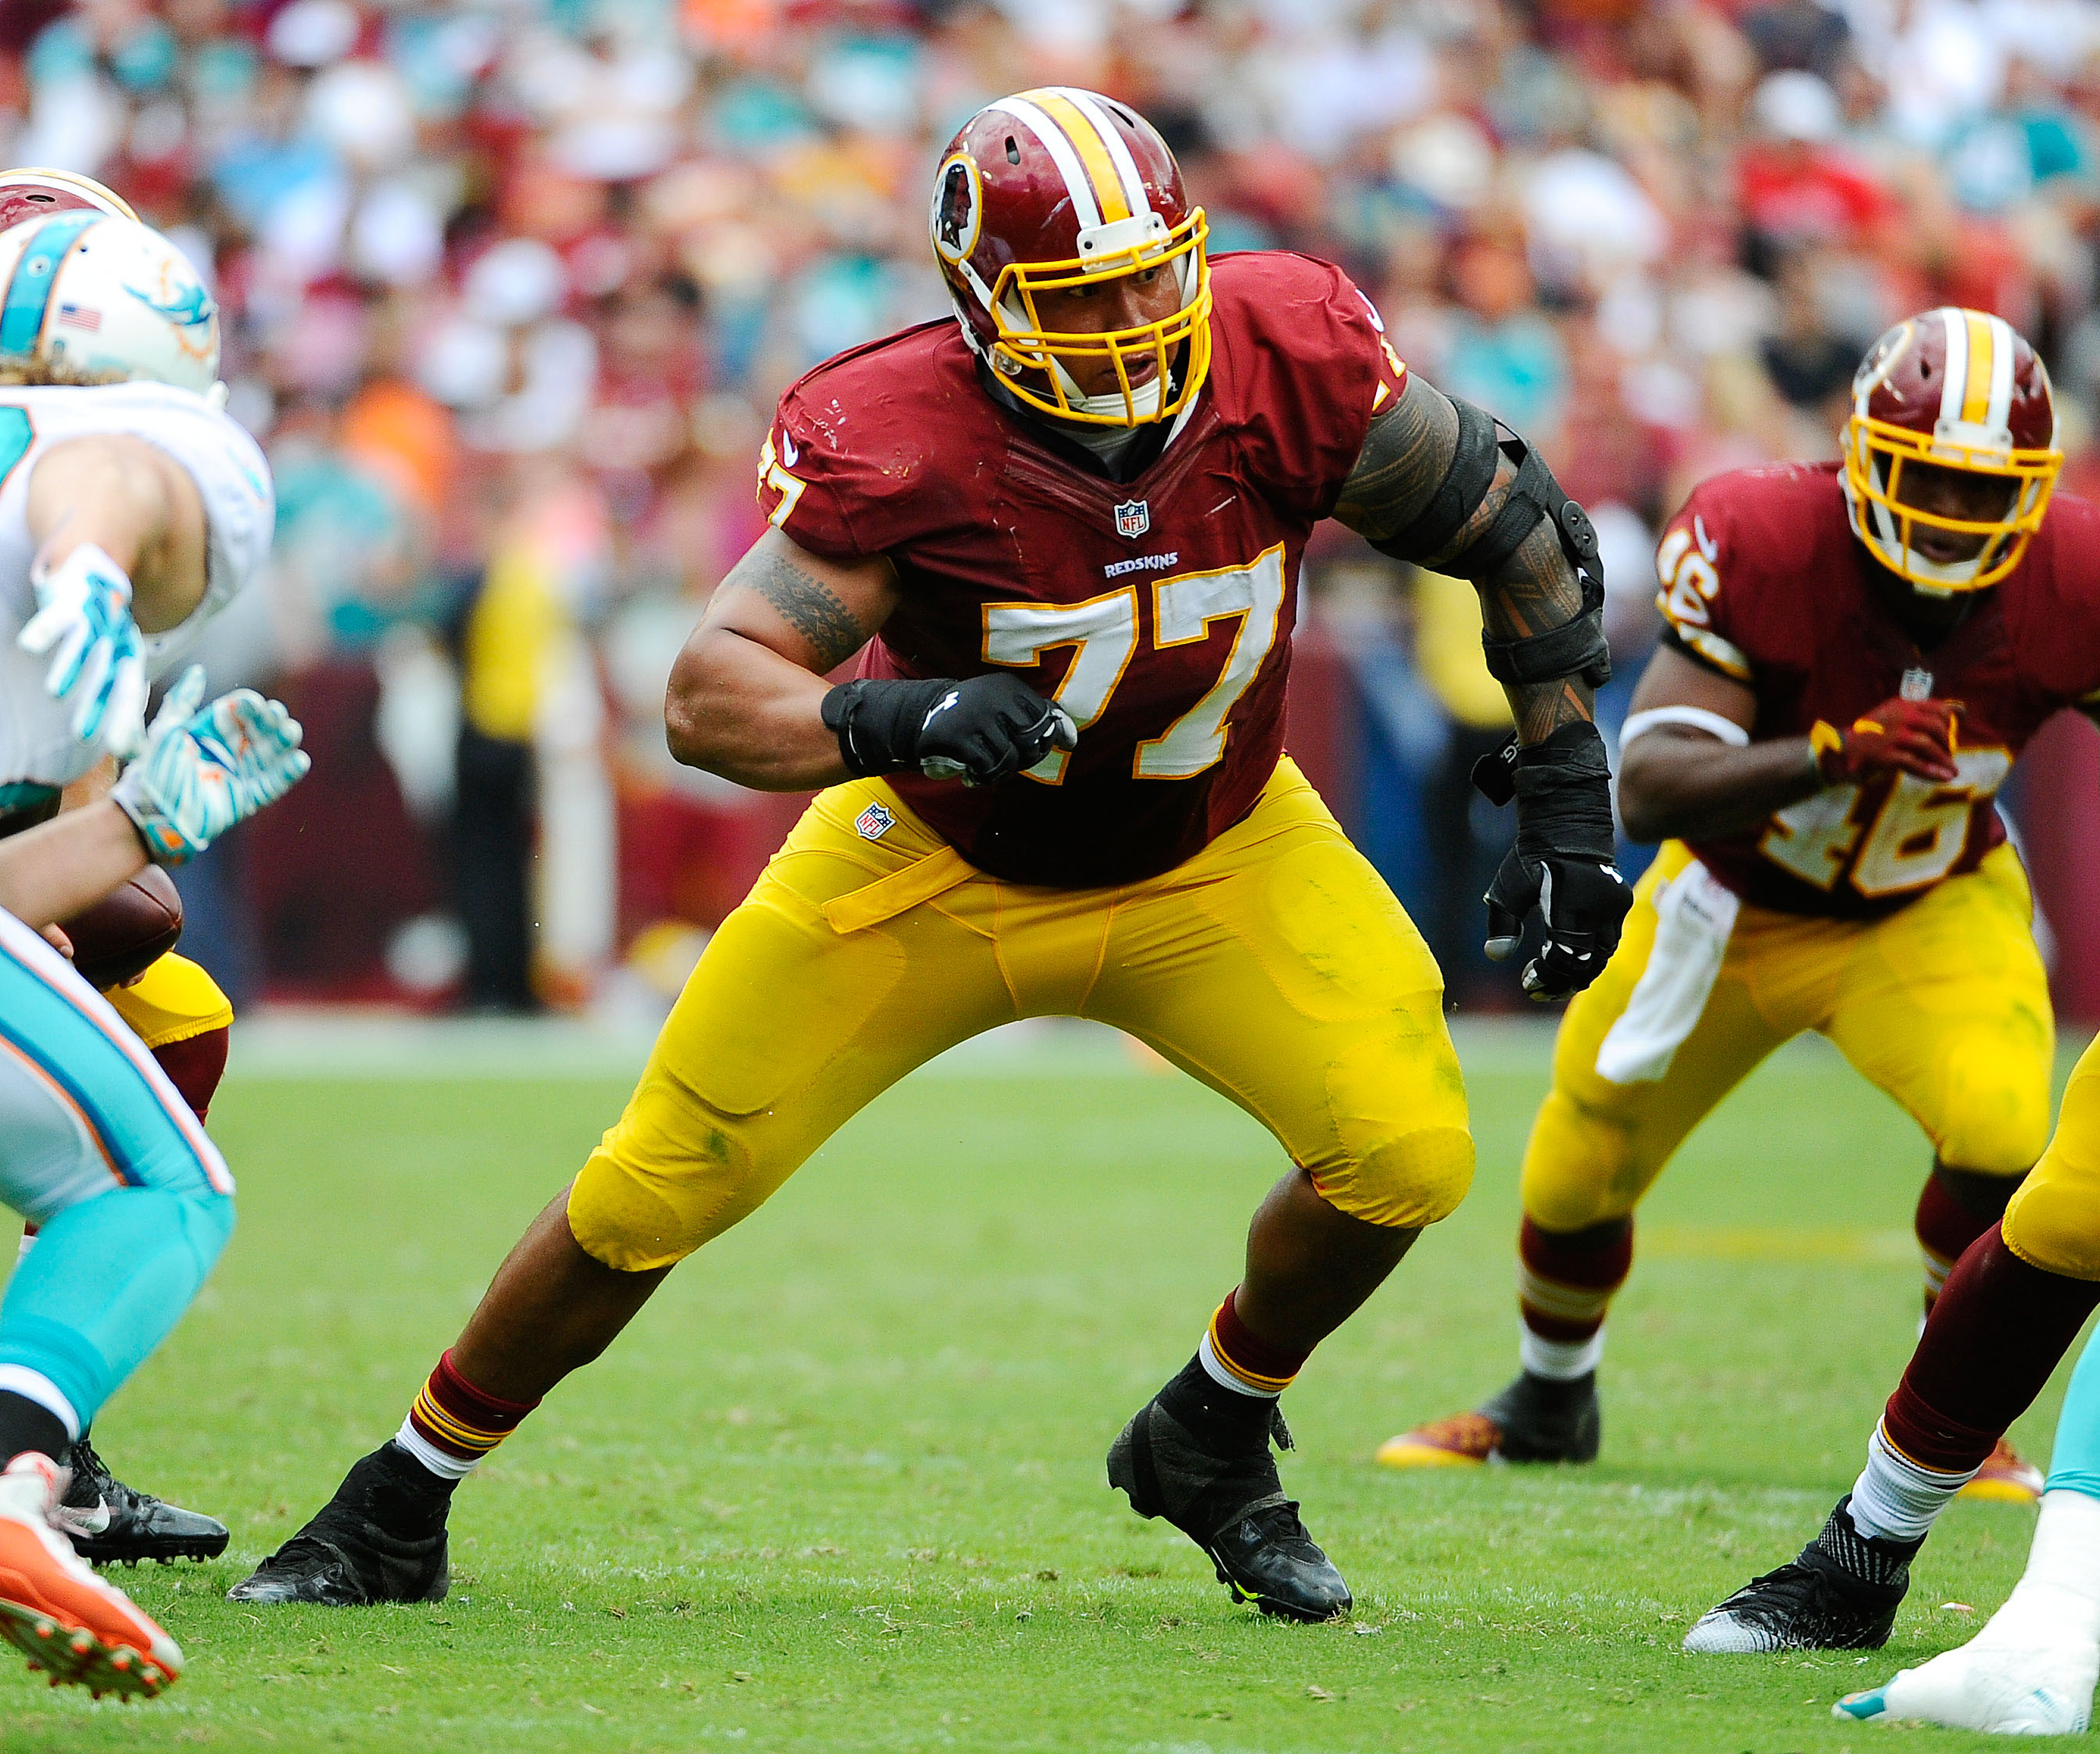 NFL: Miami Dolphins at Washington Redskins